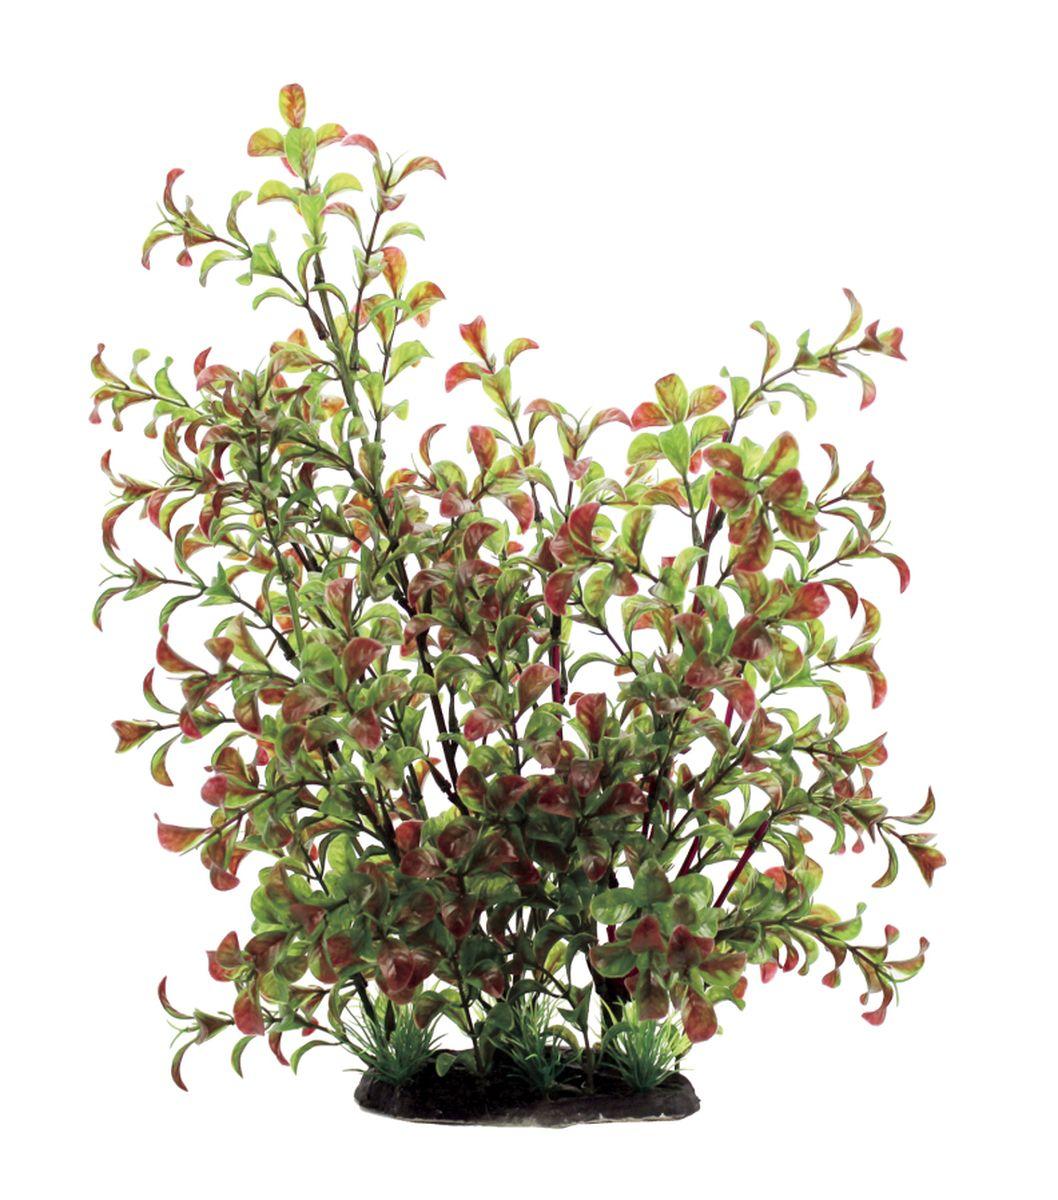 Растение для аквариума ArtUniq Людвигия красно-зеленая, высота 35 смART-1130101Растение для аквариума ArtUniq Людвигия красно-зеленая, высота 35 см